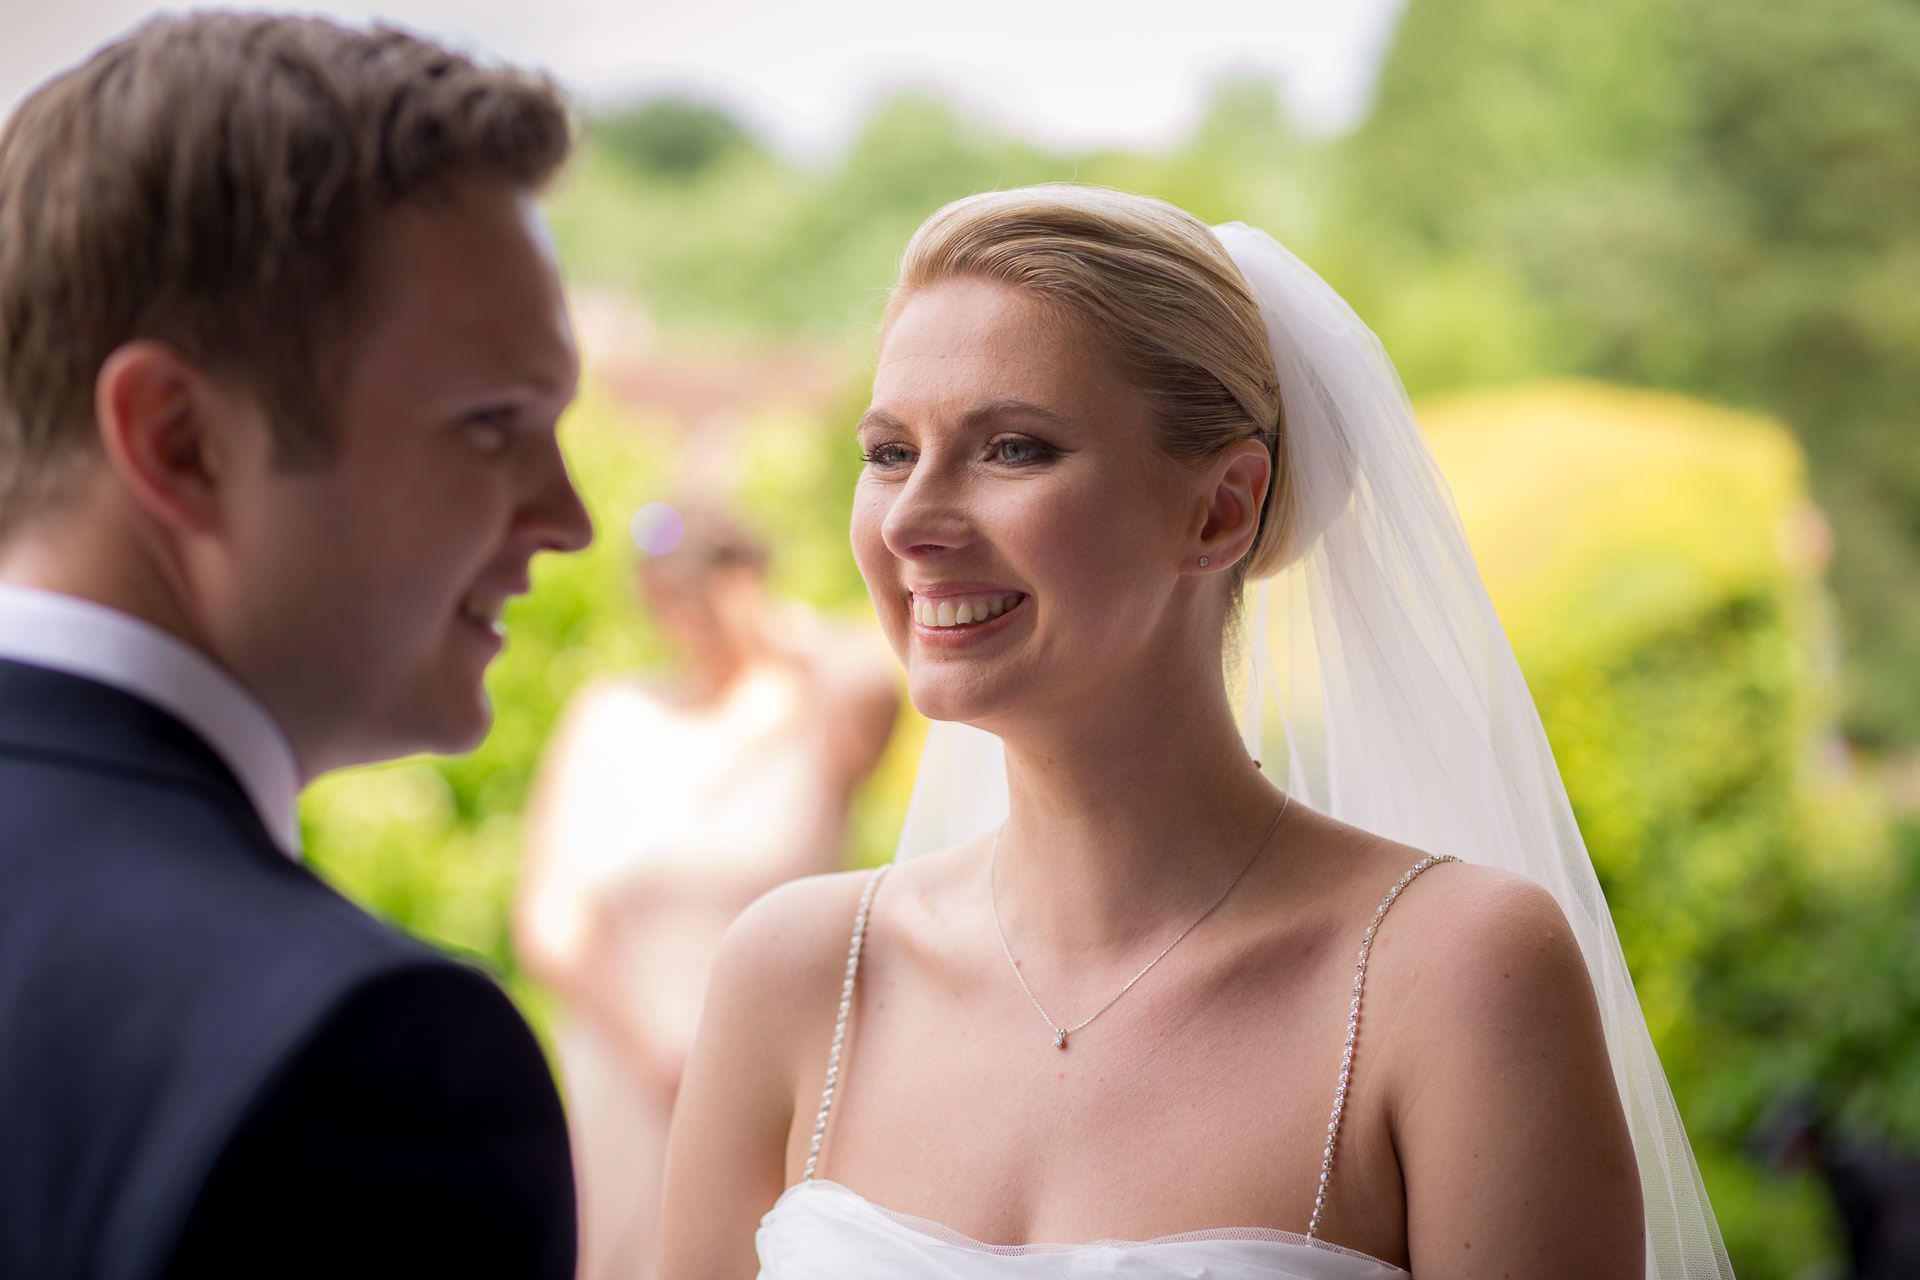 Wotton House wedding bride smiles to the groom